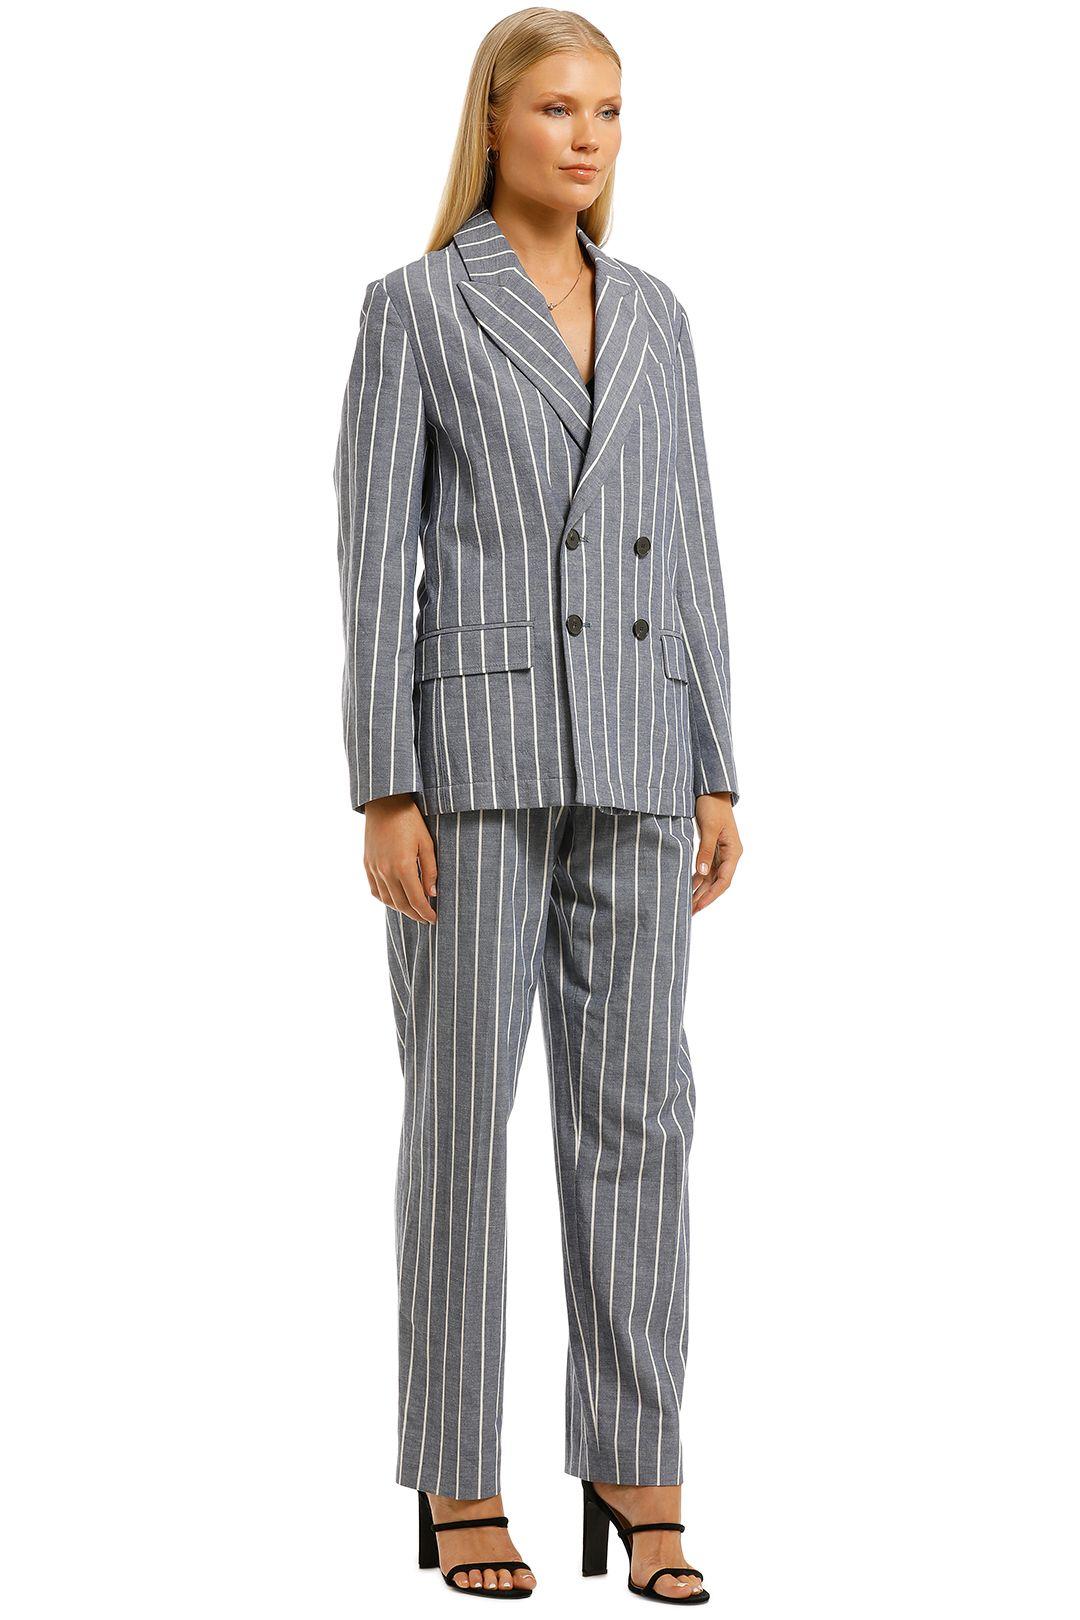 Laquintane-Double-Breasted-Jacket-and-Pant-Set-Indigo-Stripe-Side